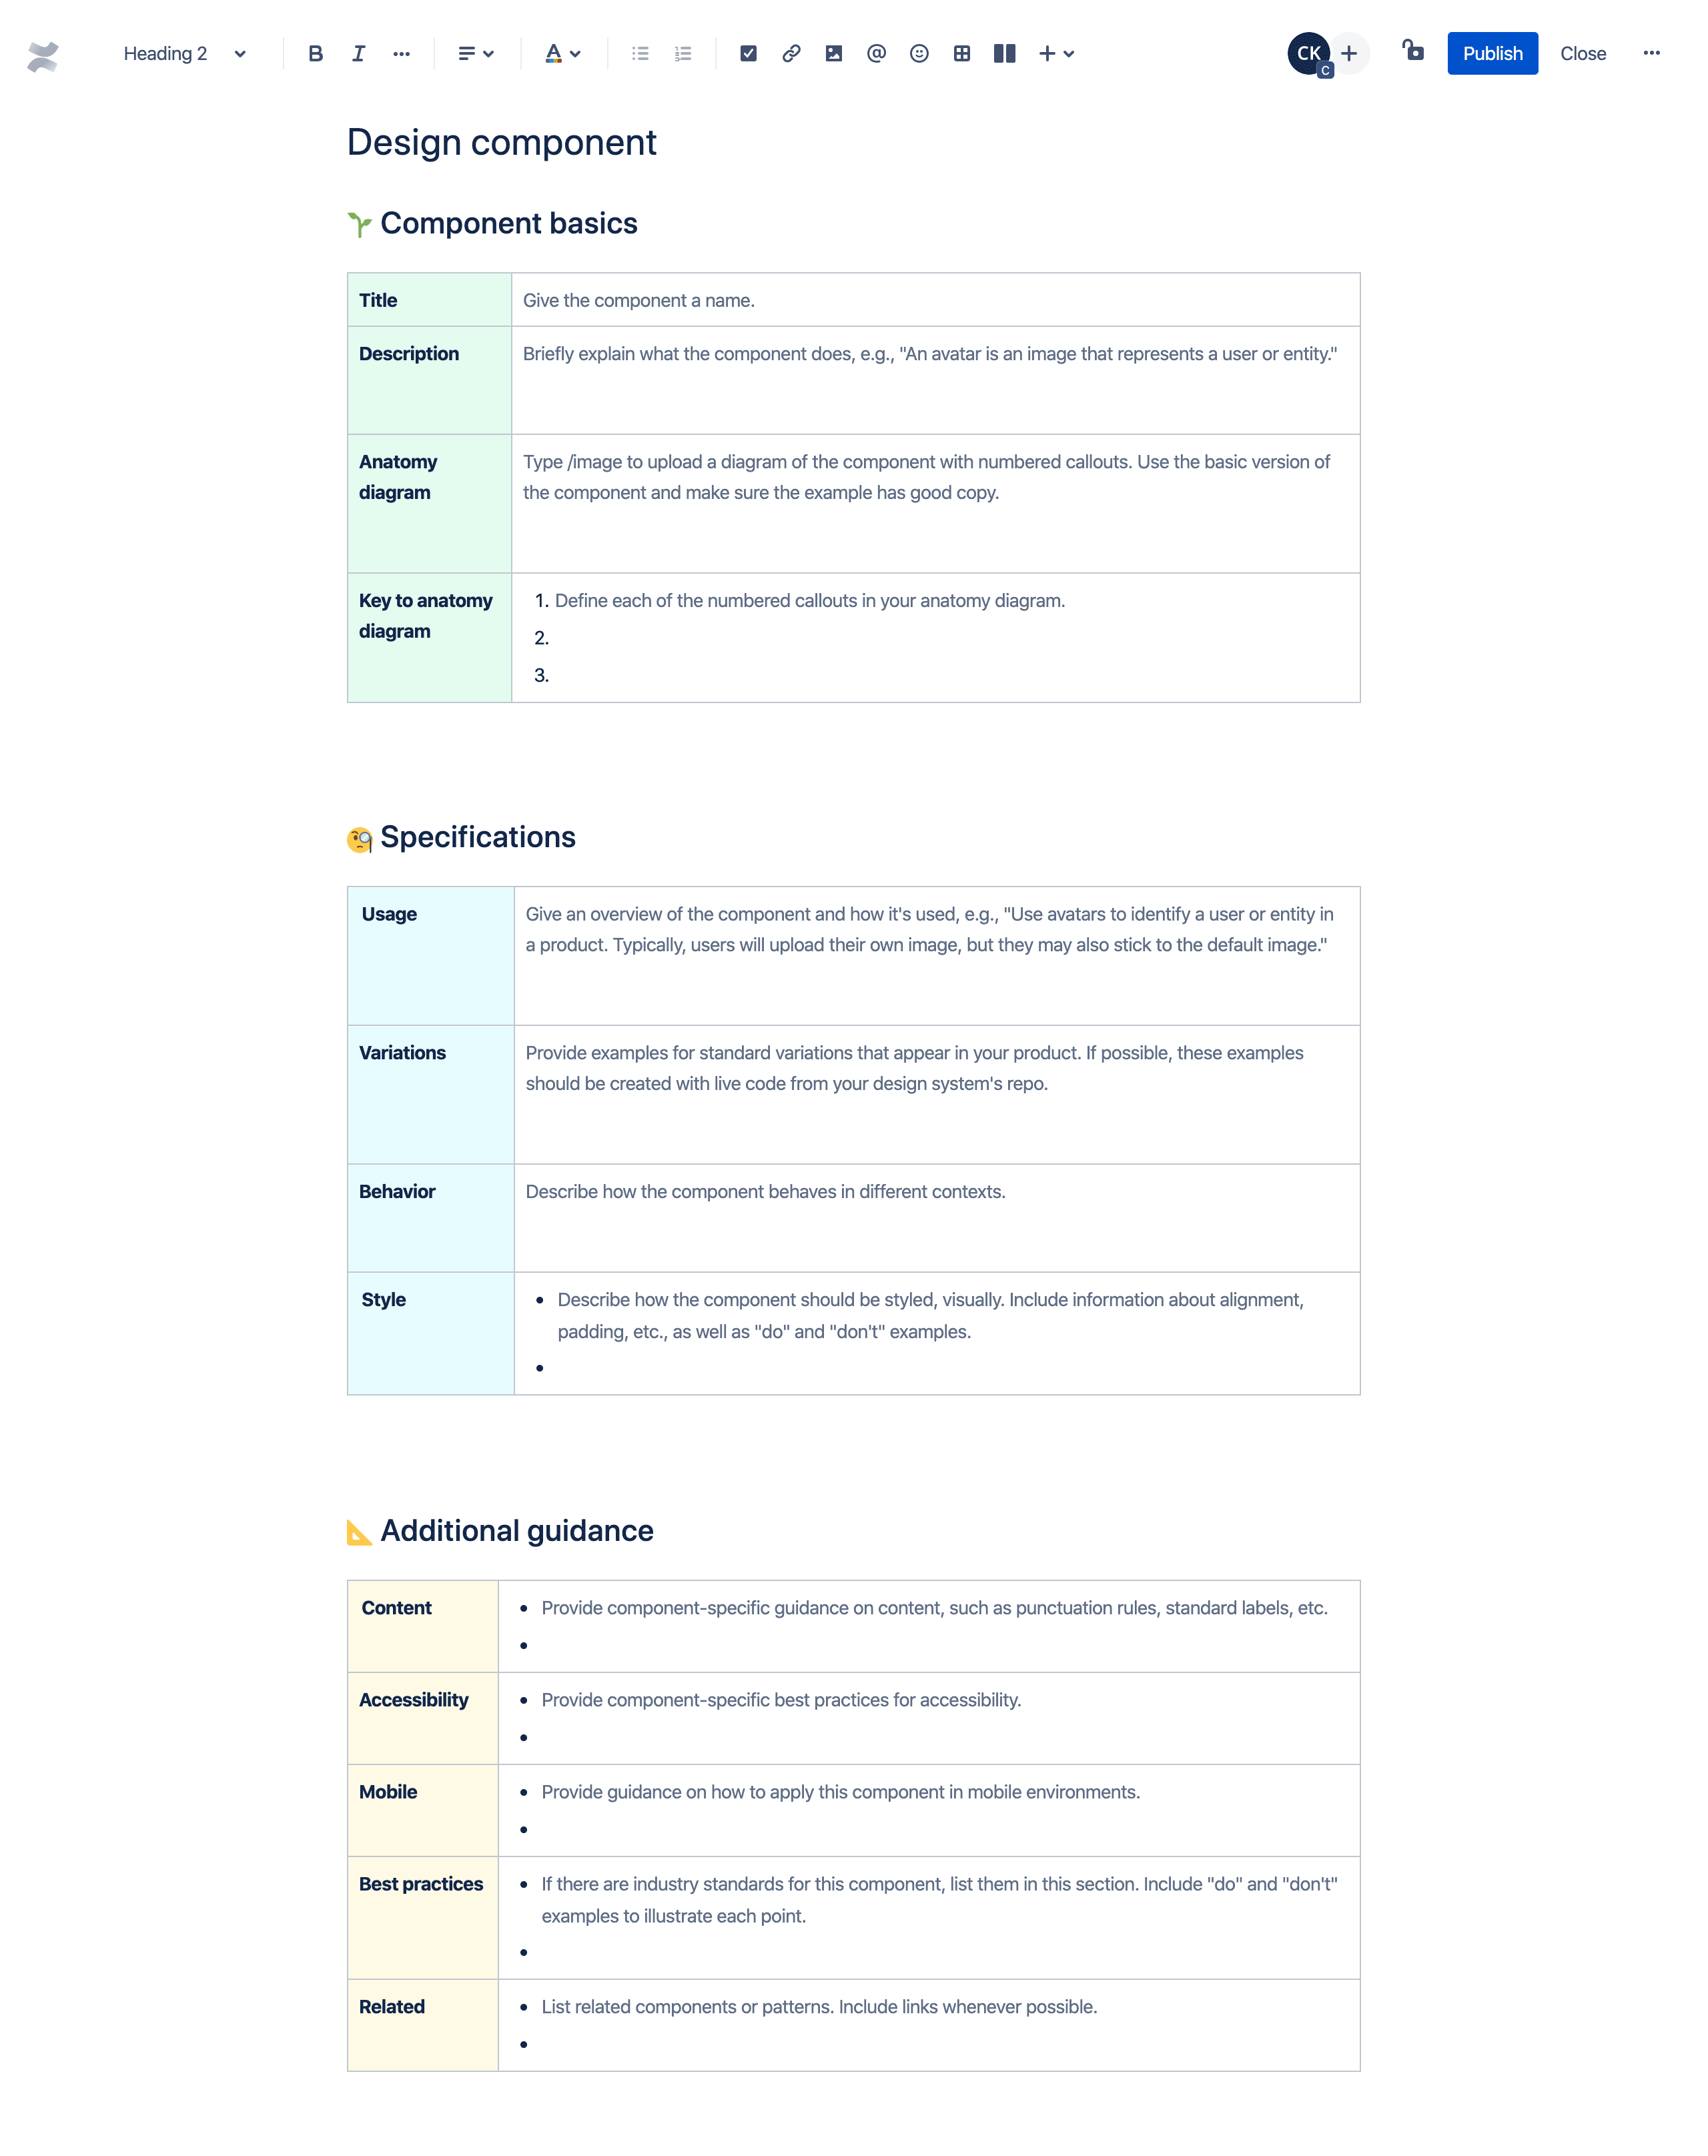 Design component template